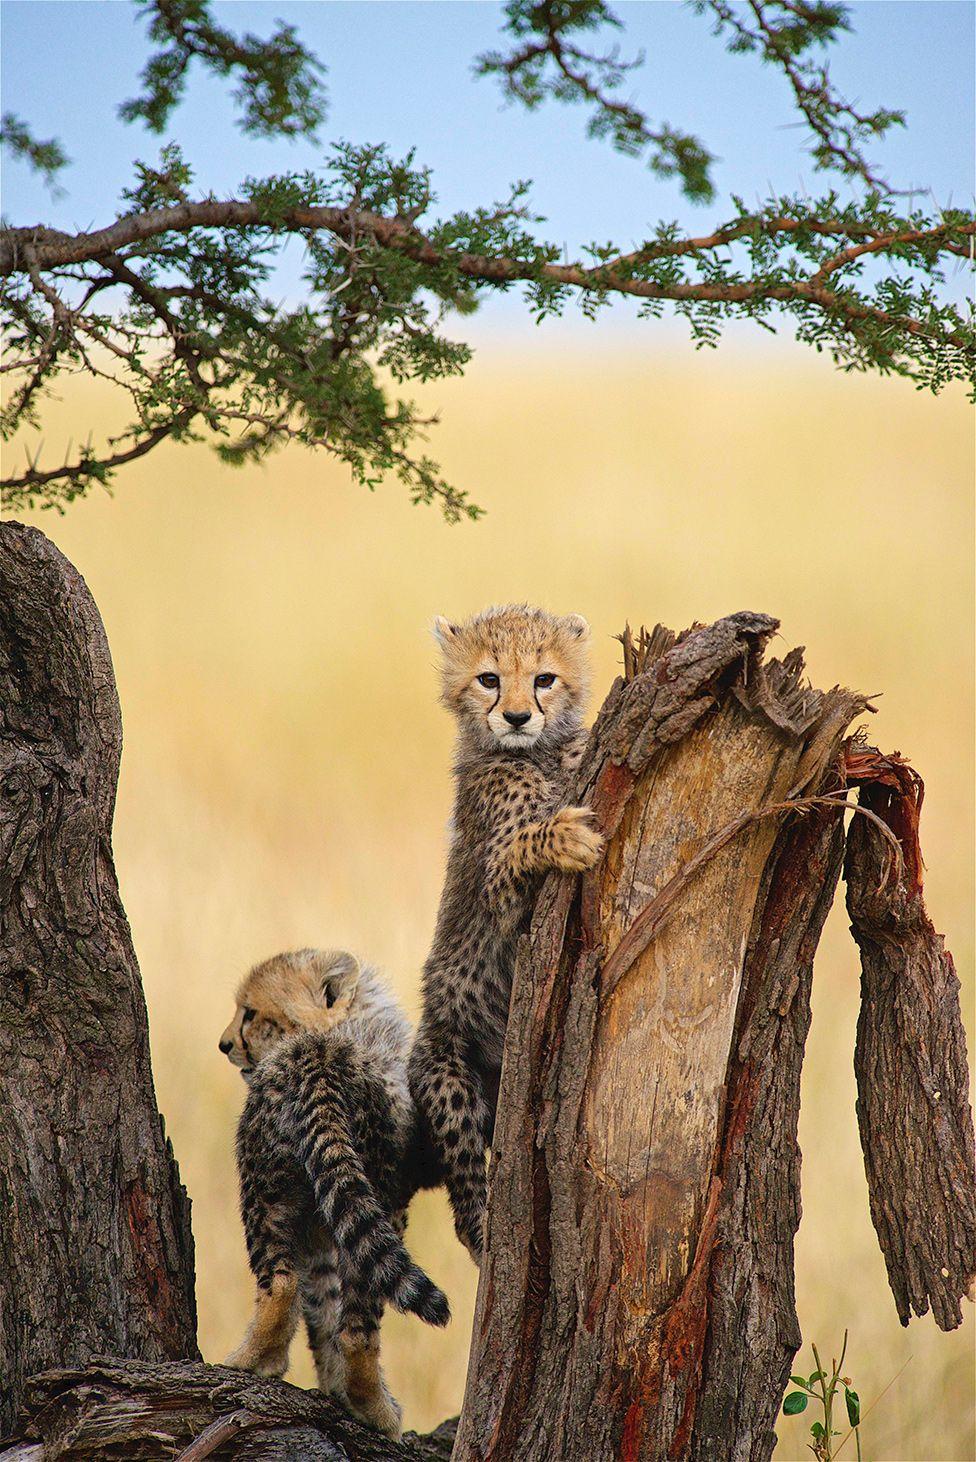 A cheetah cub clutching a tree trunk